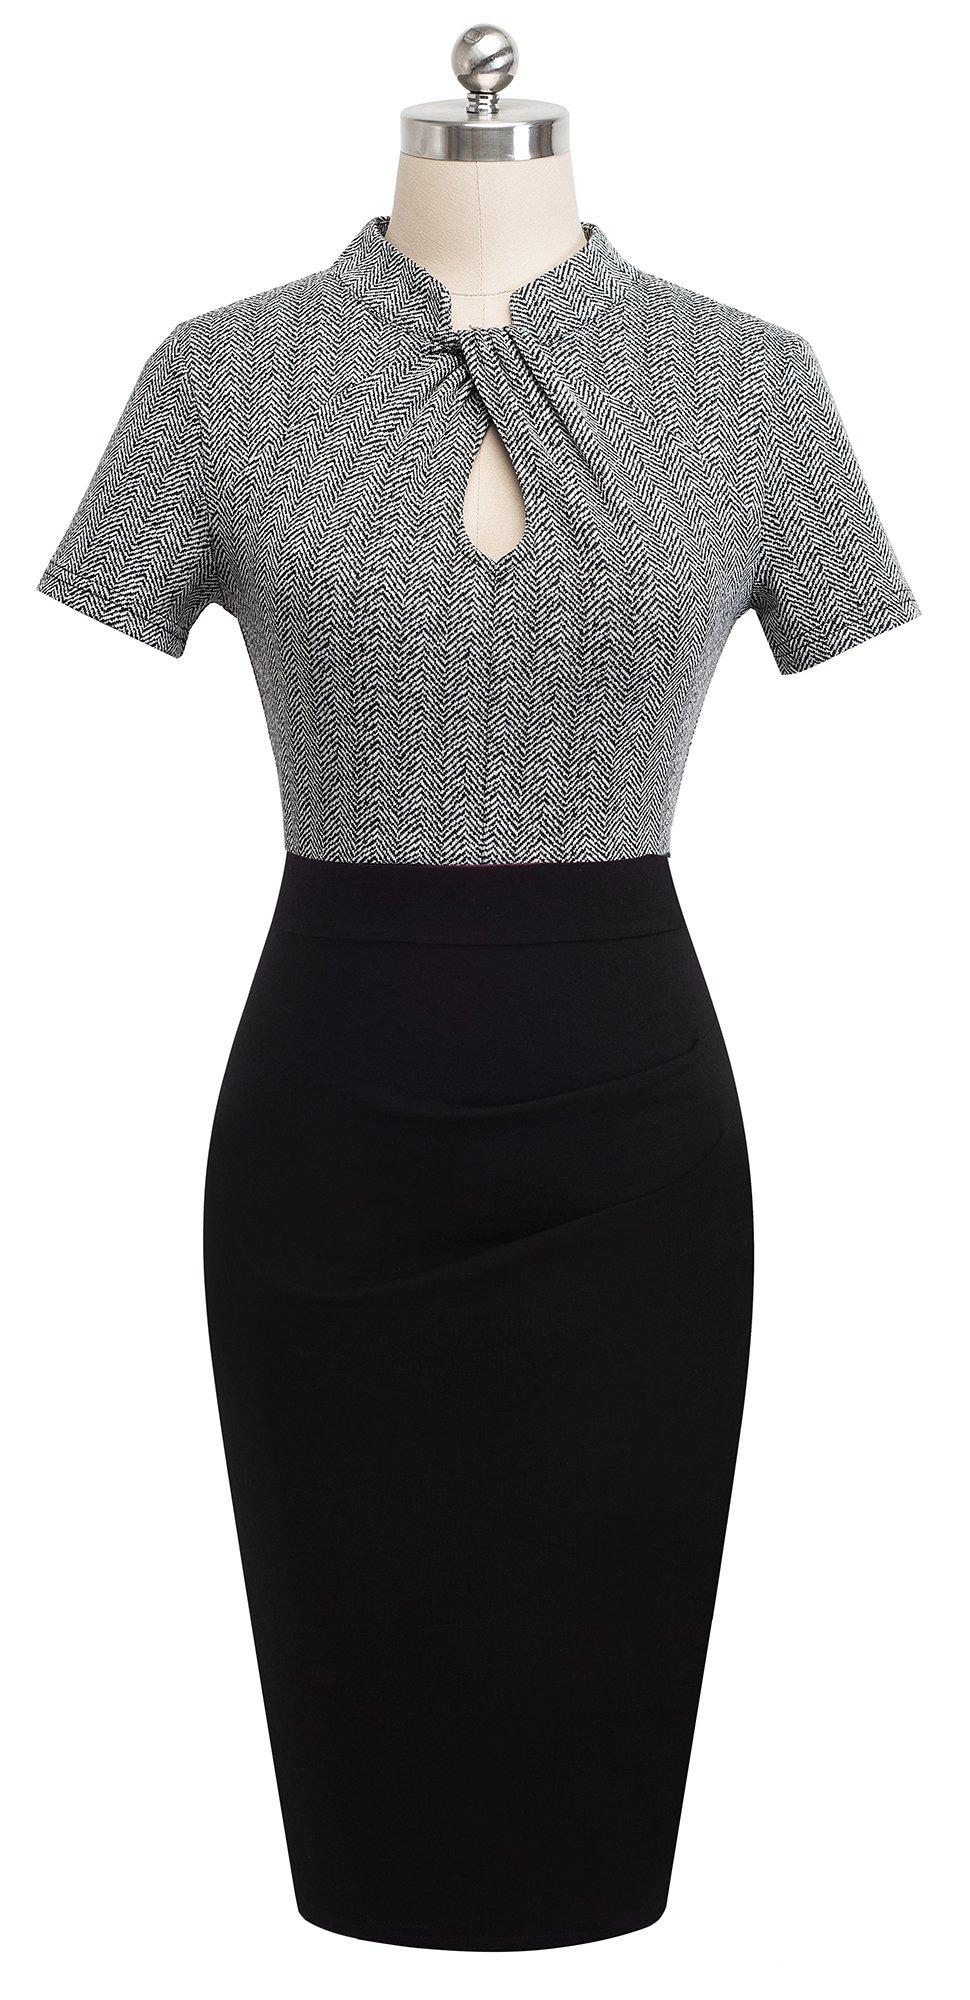 HOMEYEE Women's Short Sleeve Business Church Dress B430 (4, Gray) by HOMEYEE (Image #2)